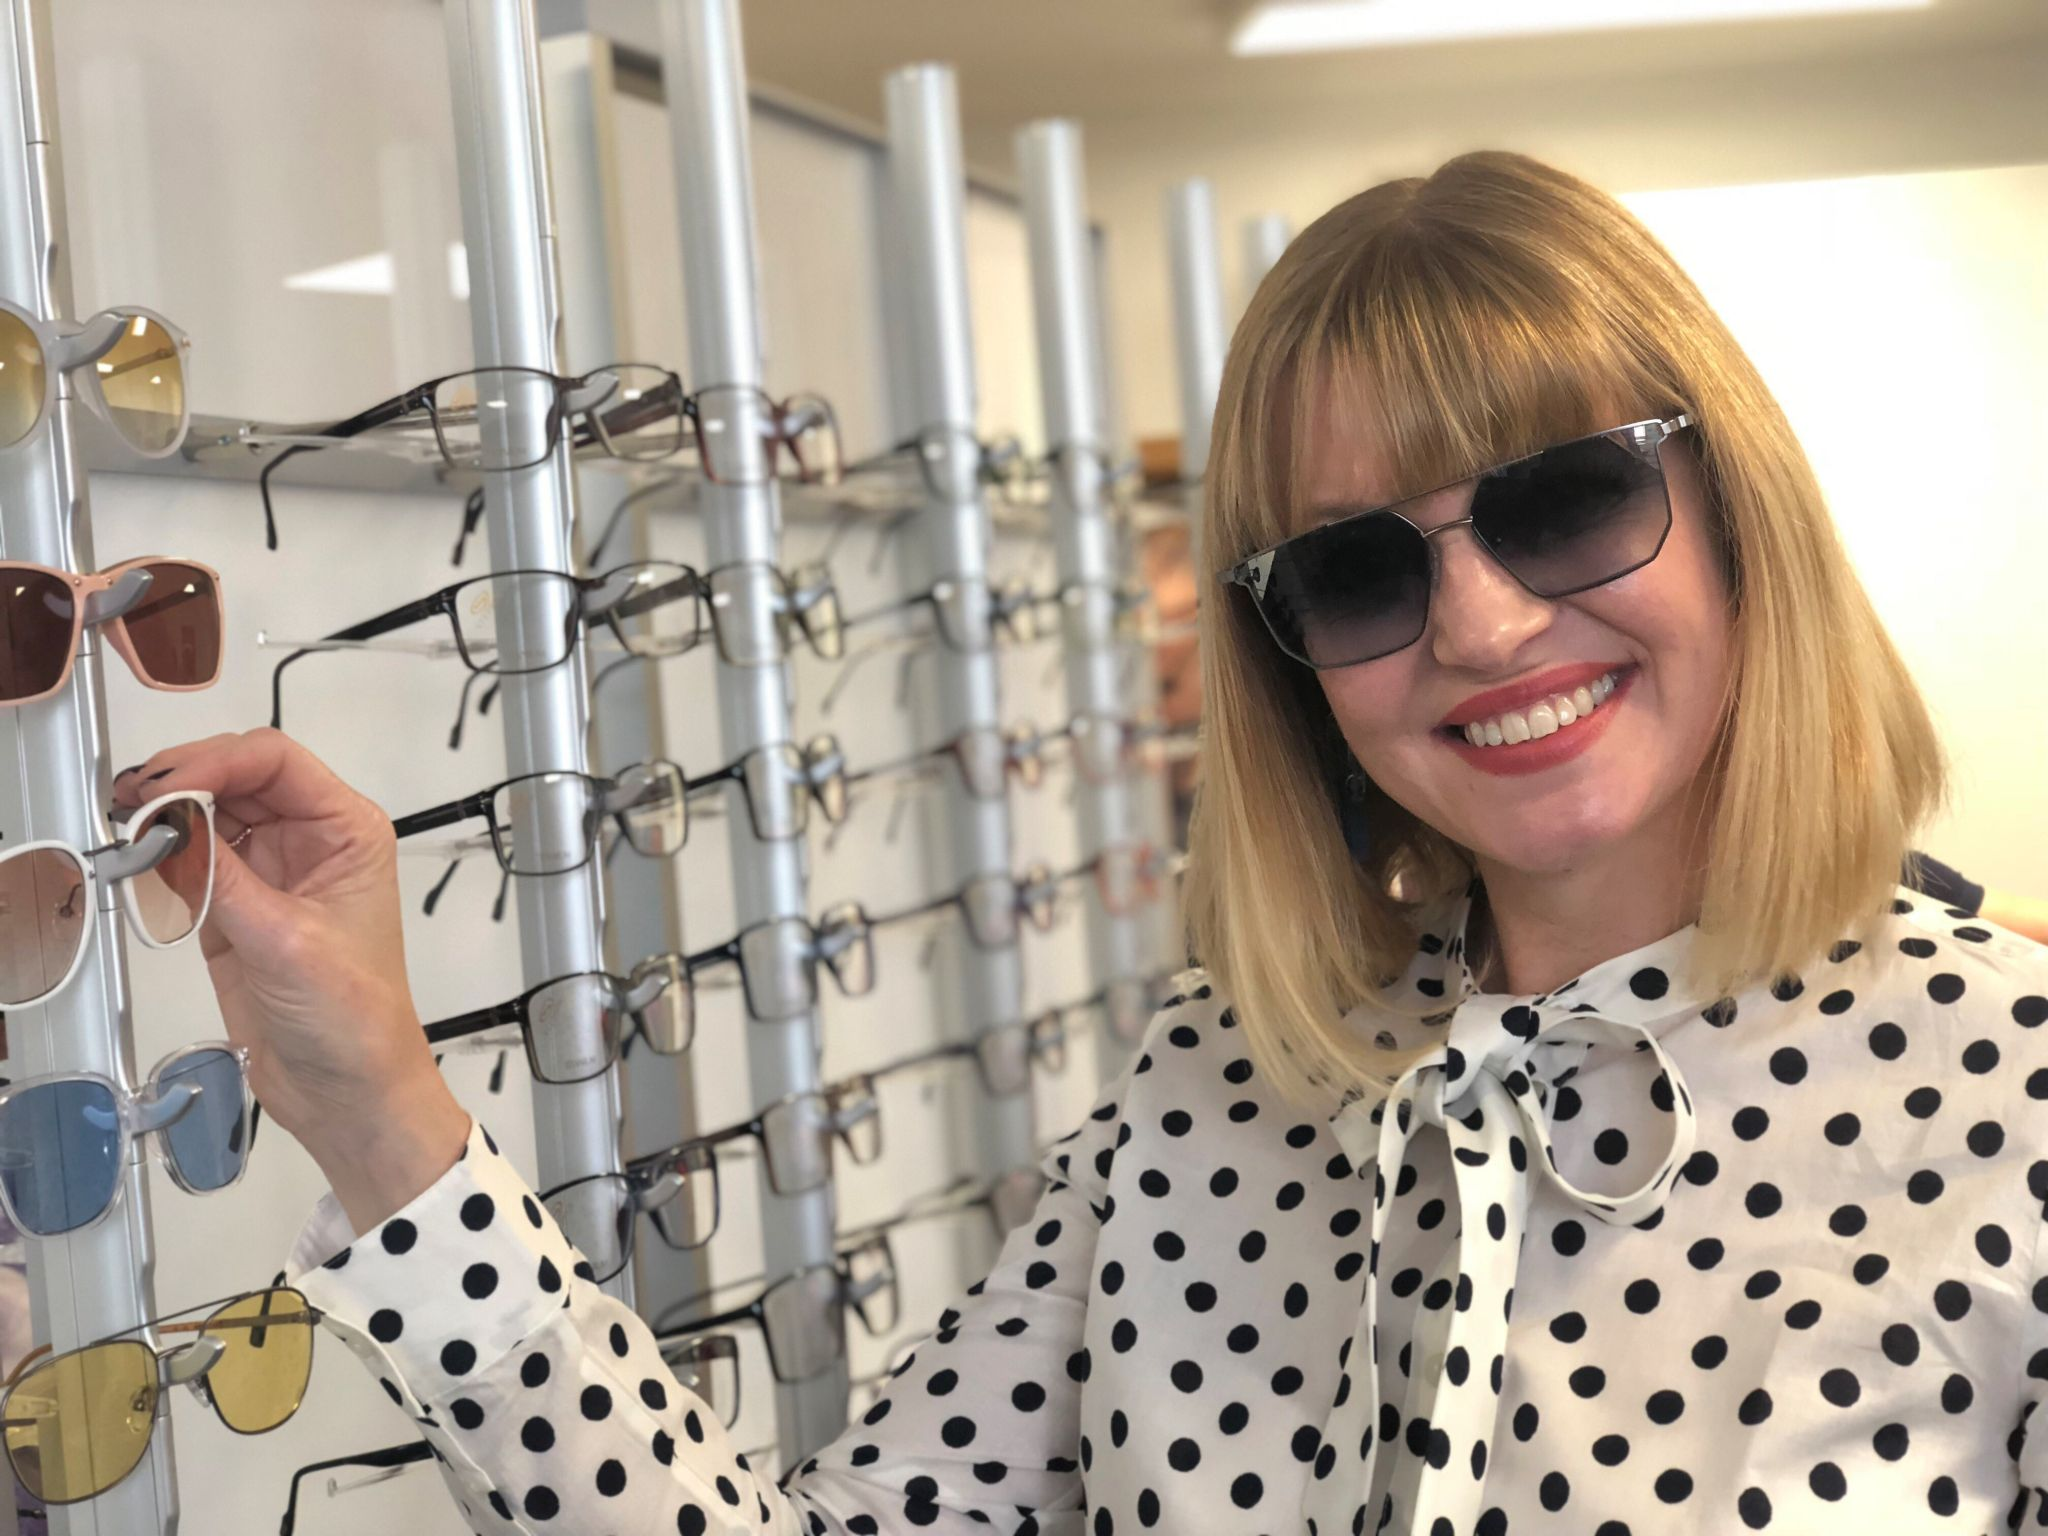 What Lizzy Loves Stepper frames